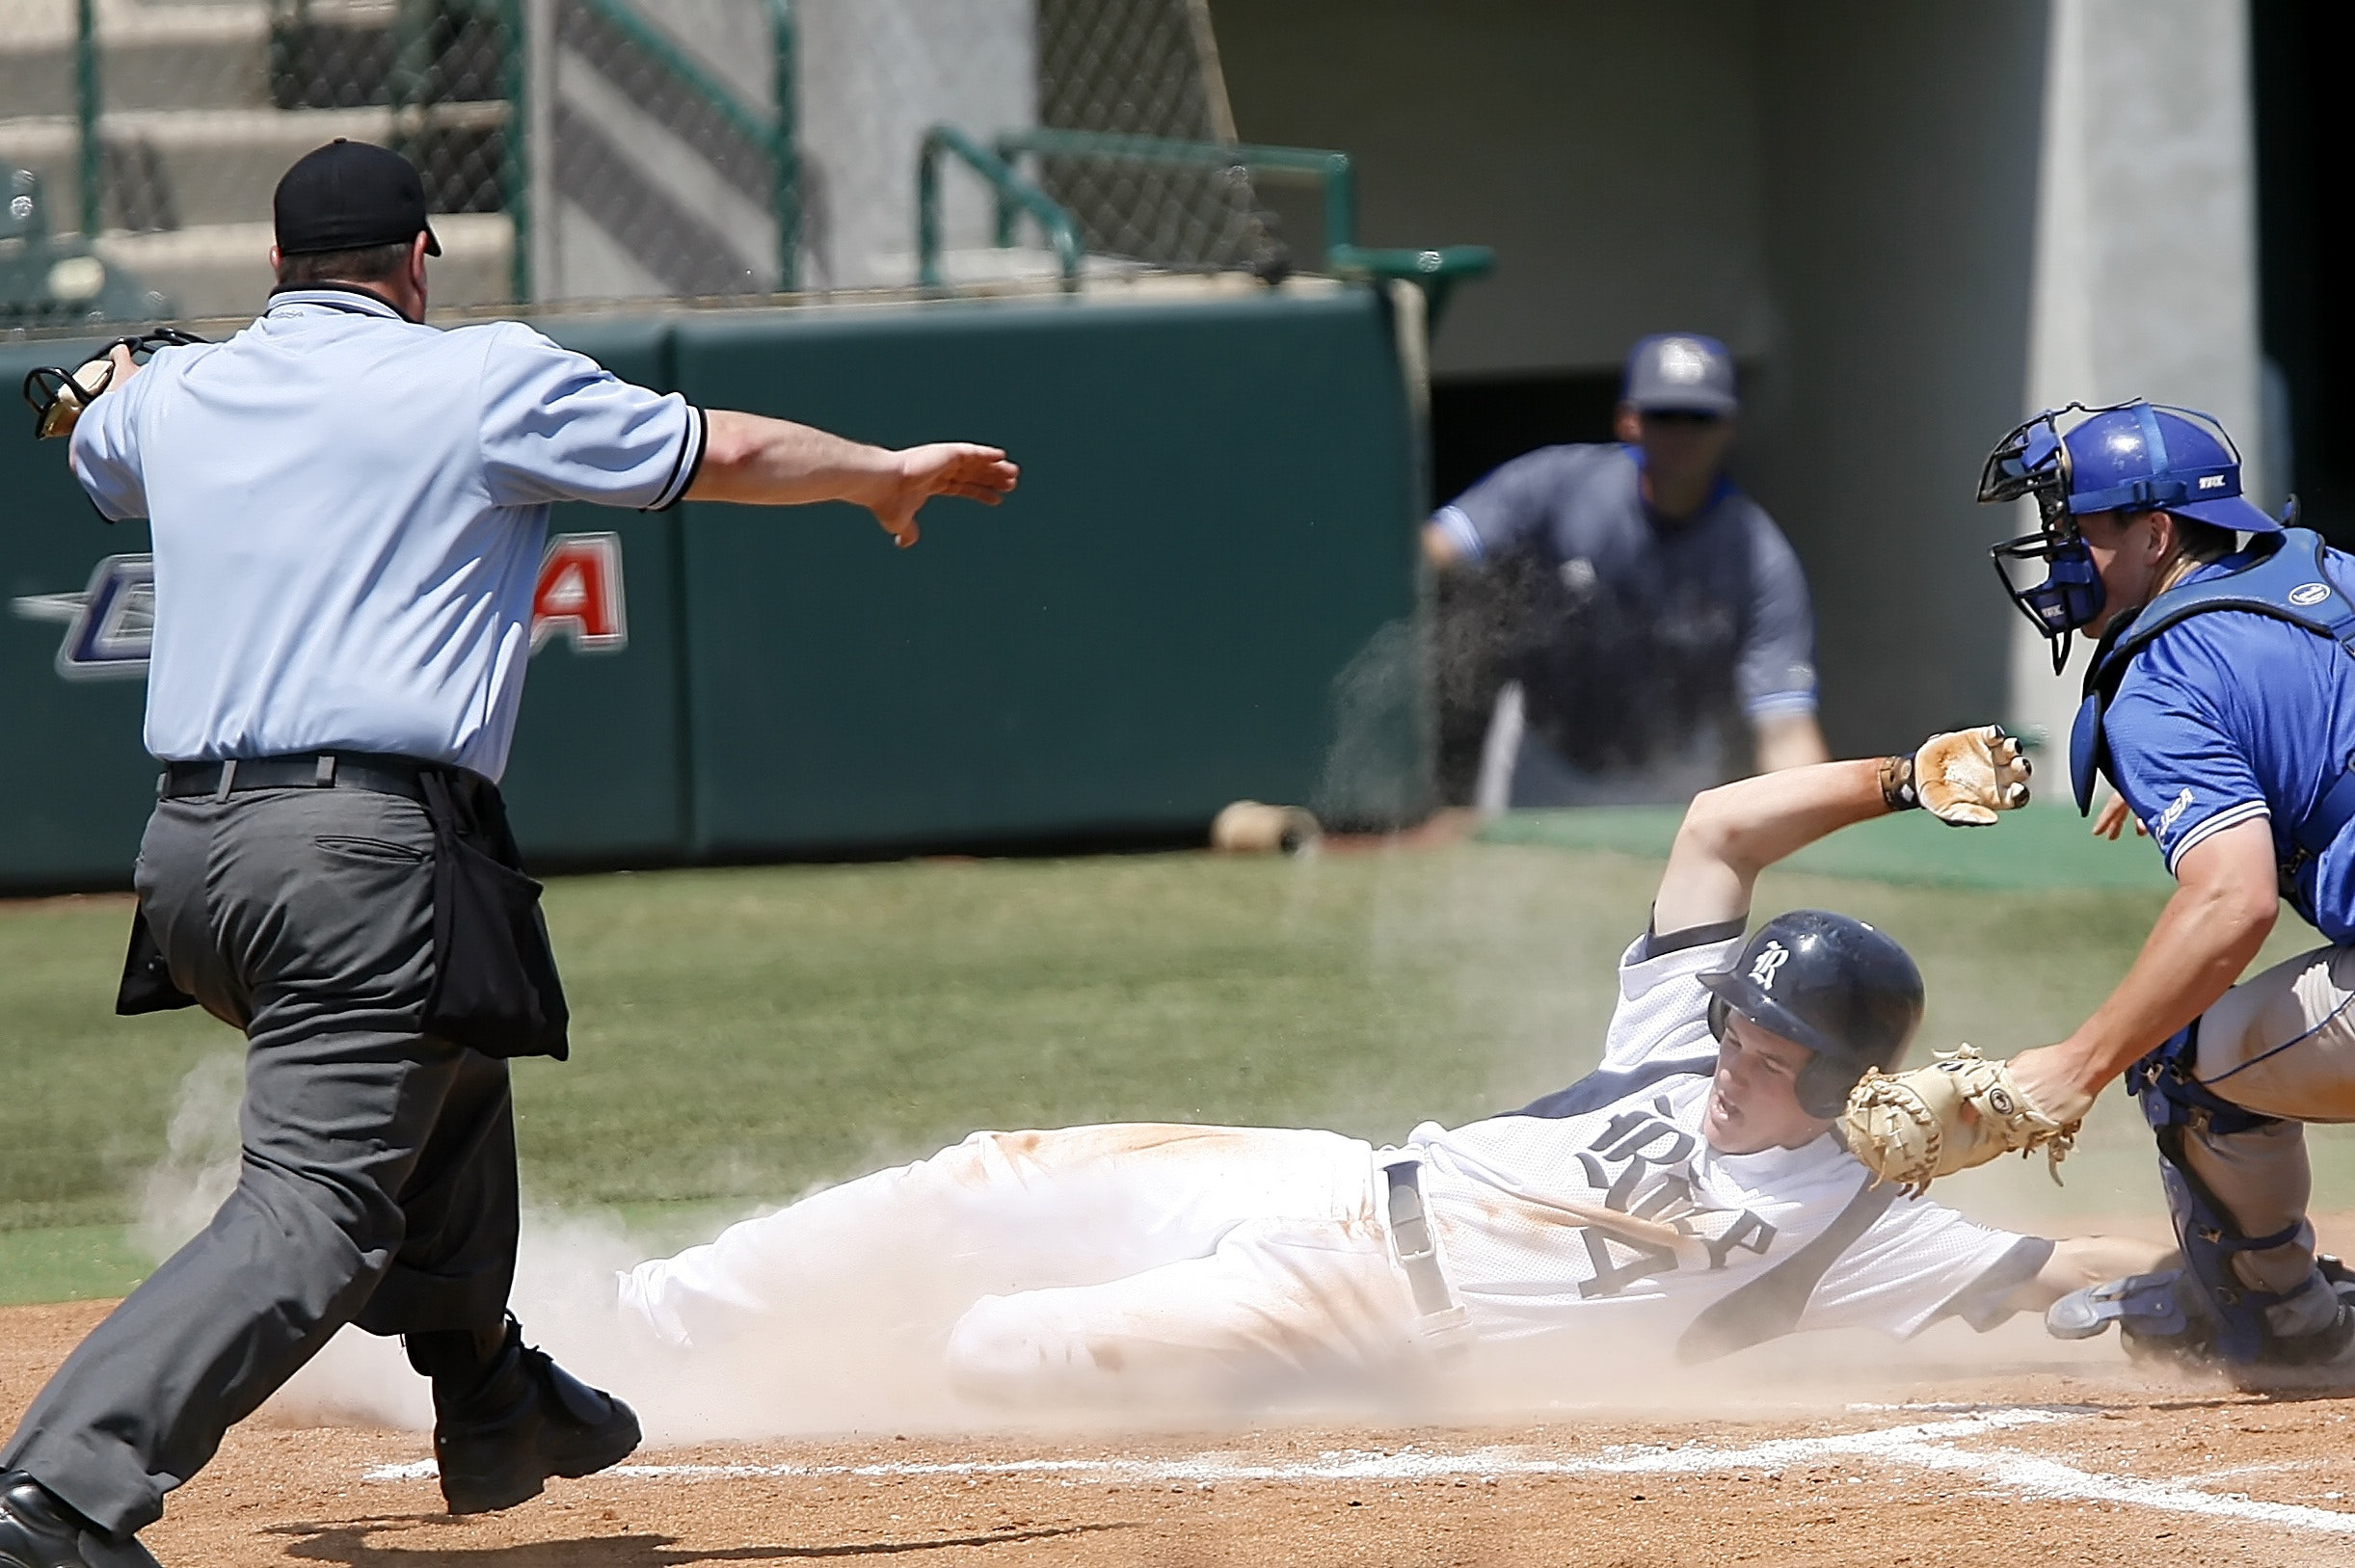 Man With White T Shirt Running to Baseball Home, Athletes, Baseball, Baseball players, Catcher, HQ Photo